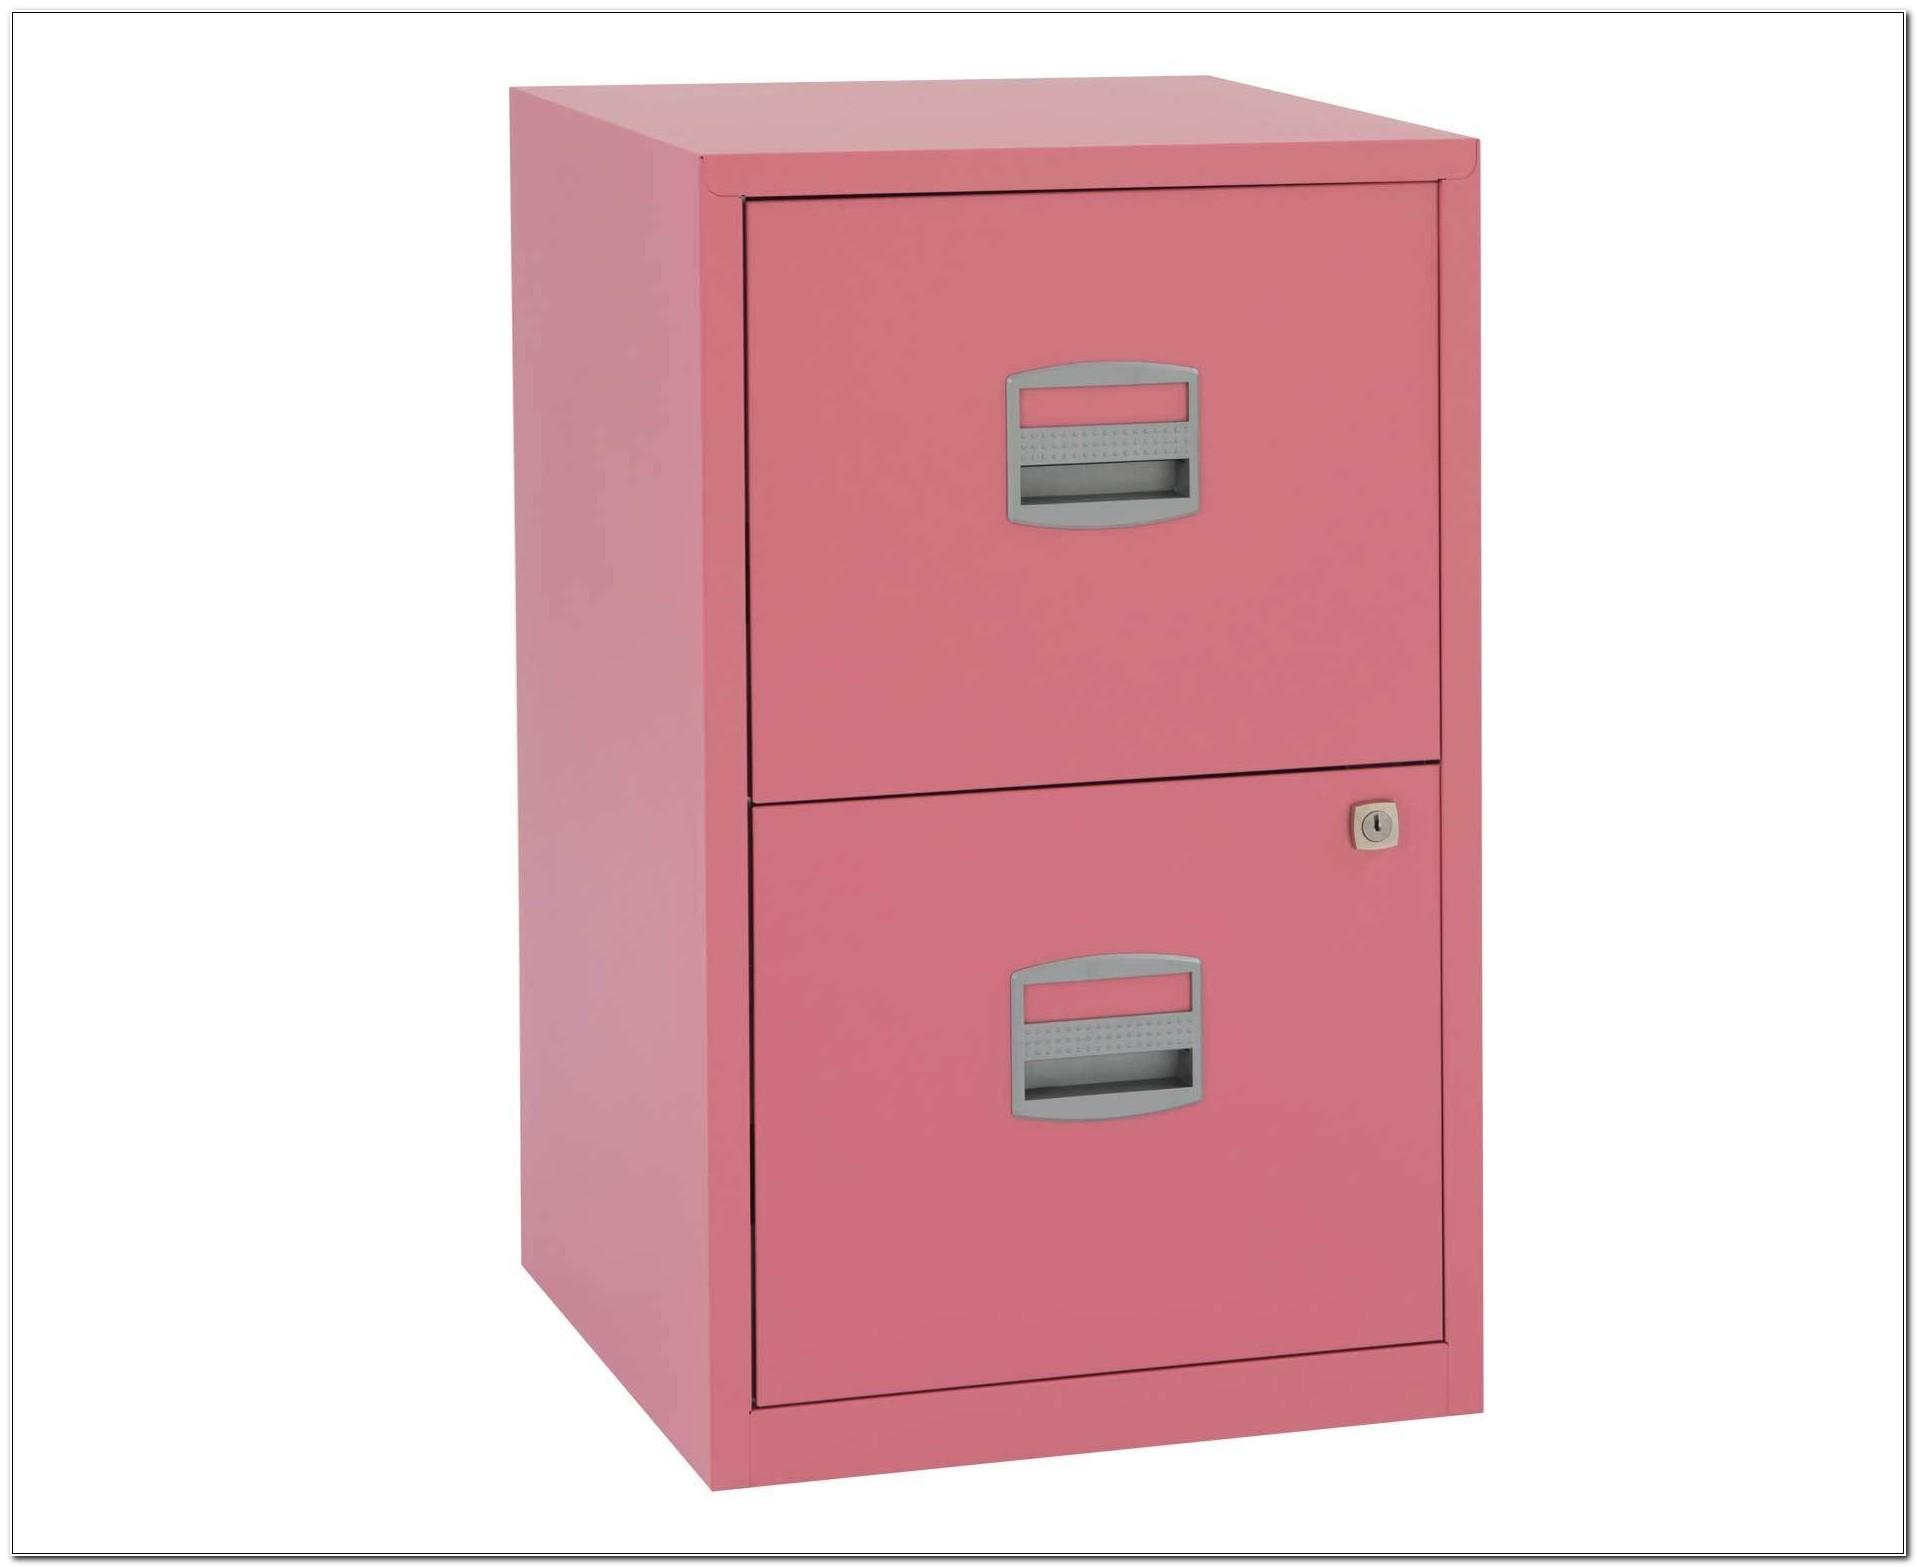 1 Drawer Foolscap Filing Cabinet